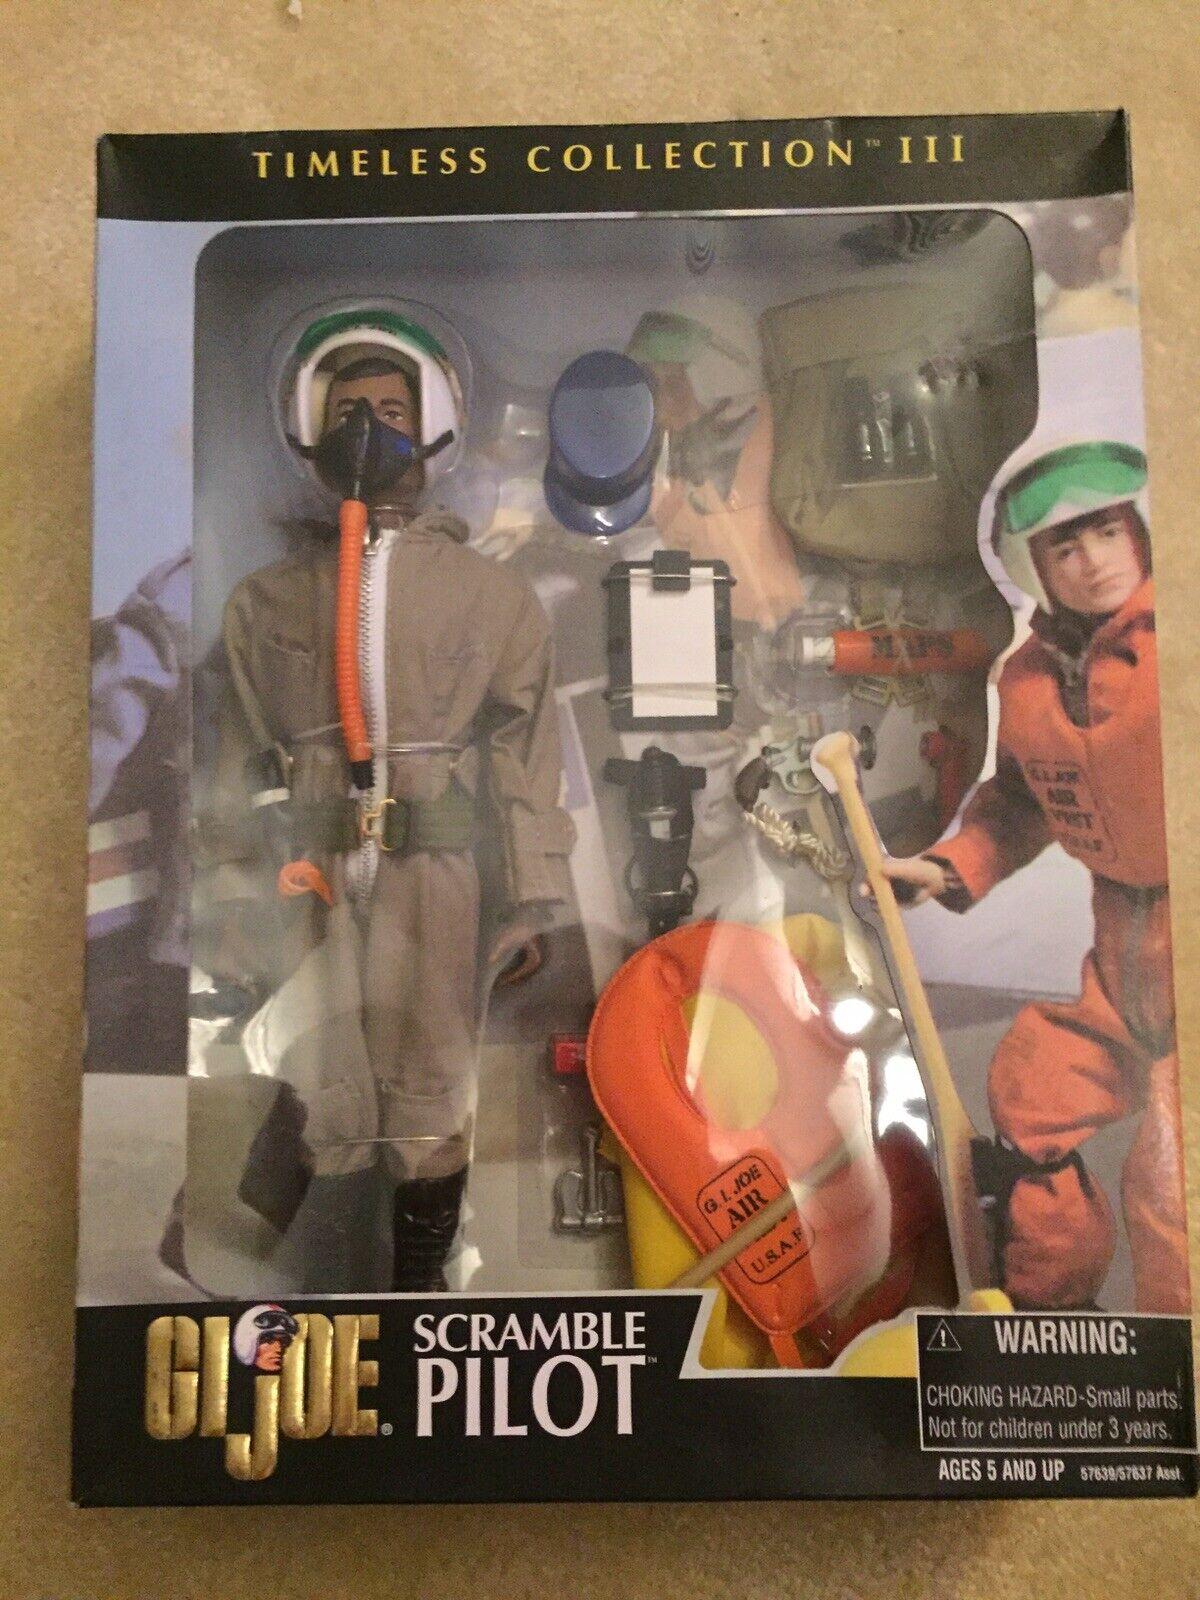 Gi Joe Timeless Collection Scrambled Pilot AA